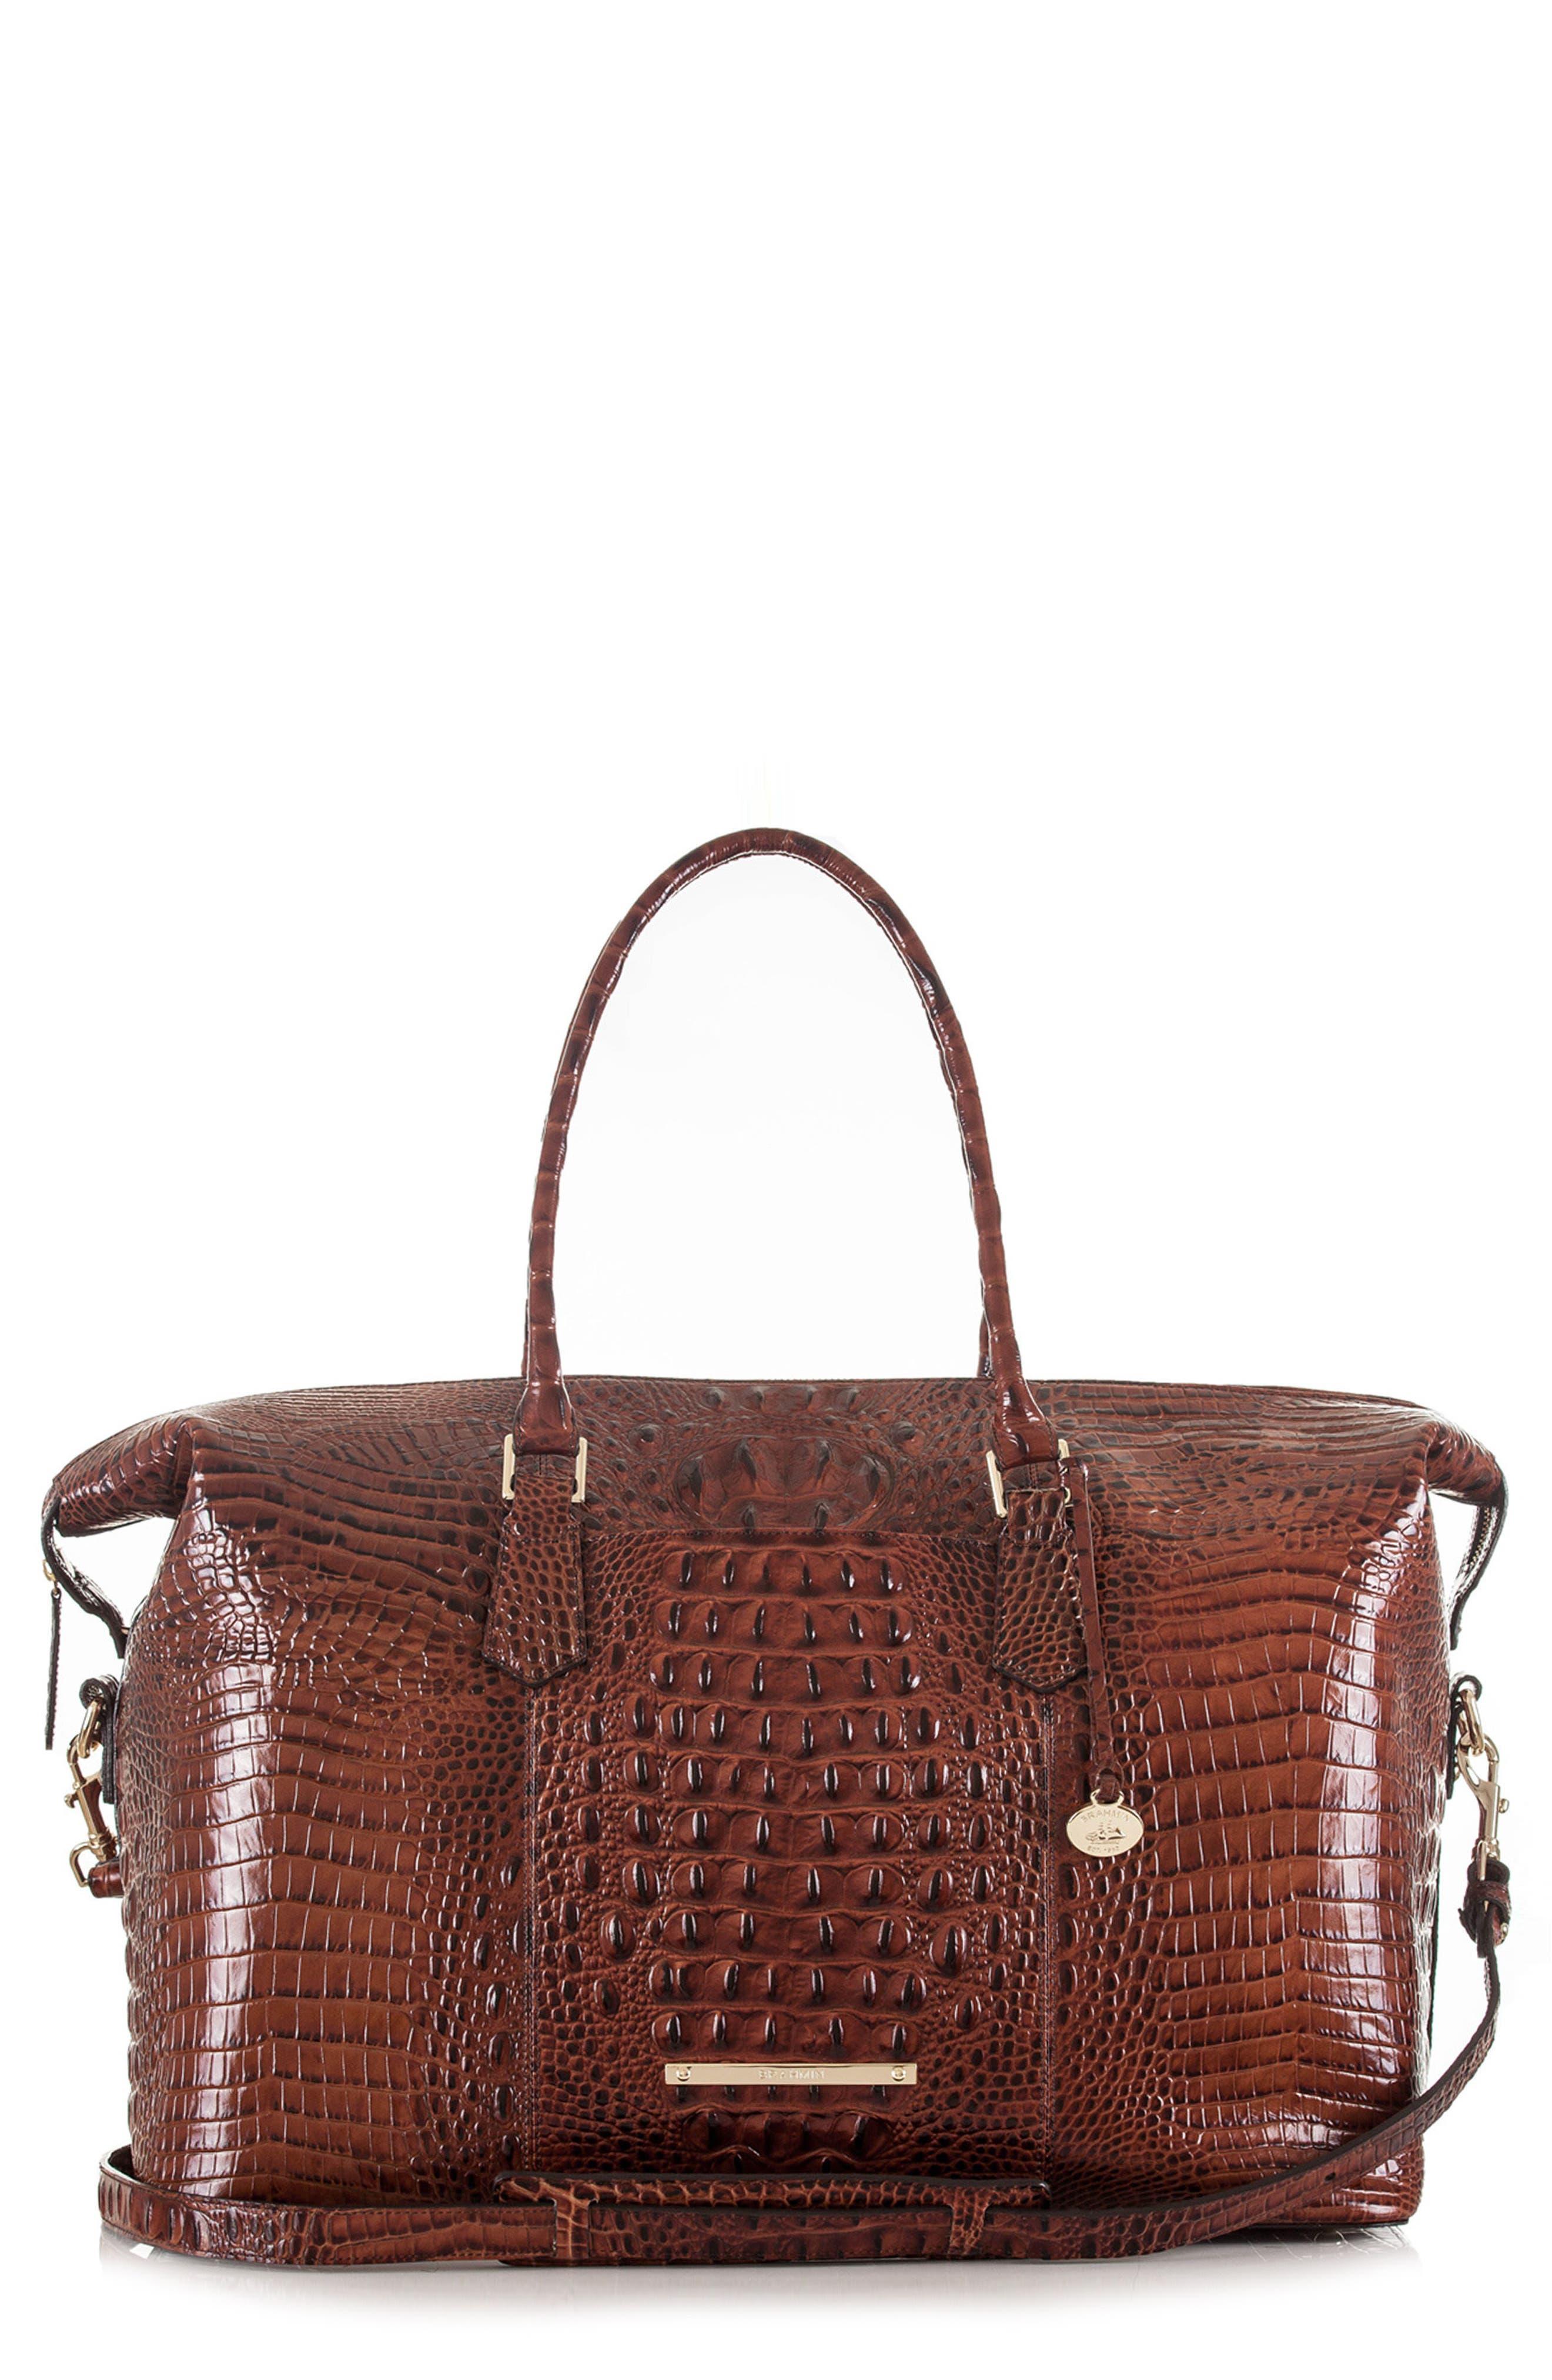 'Duxbury' Leather Travel Bag,                             Alternate thumbnail 7, color,